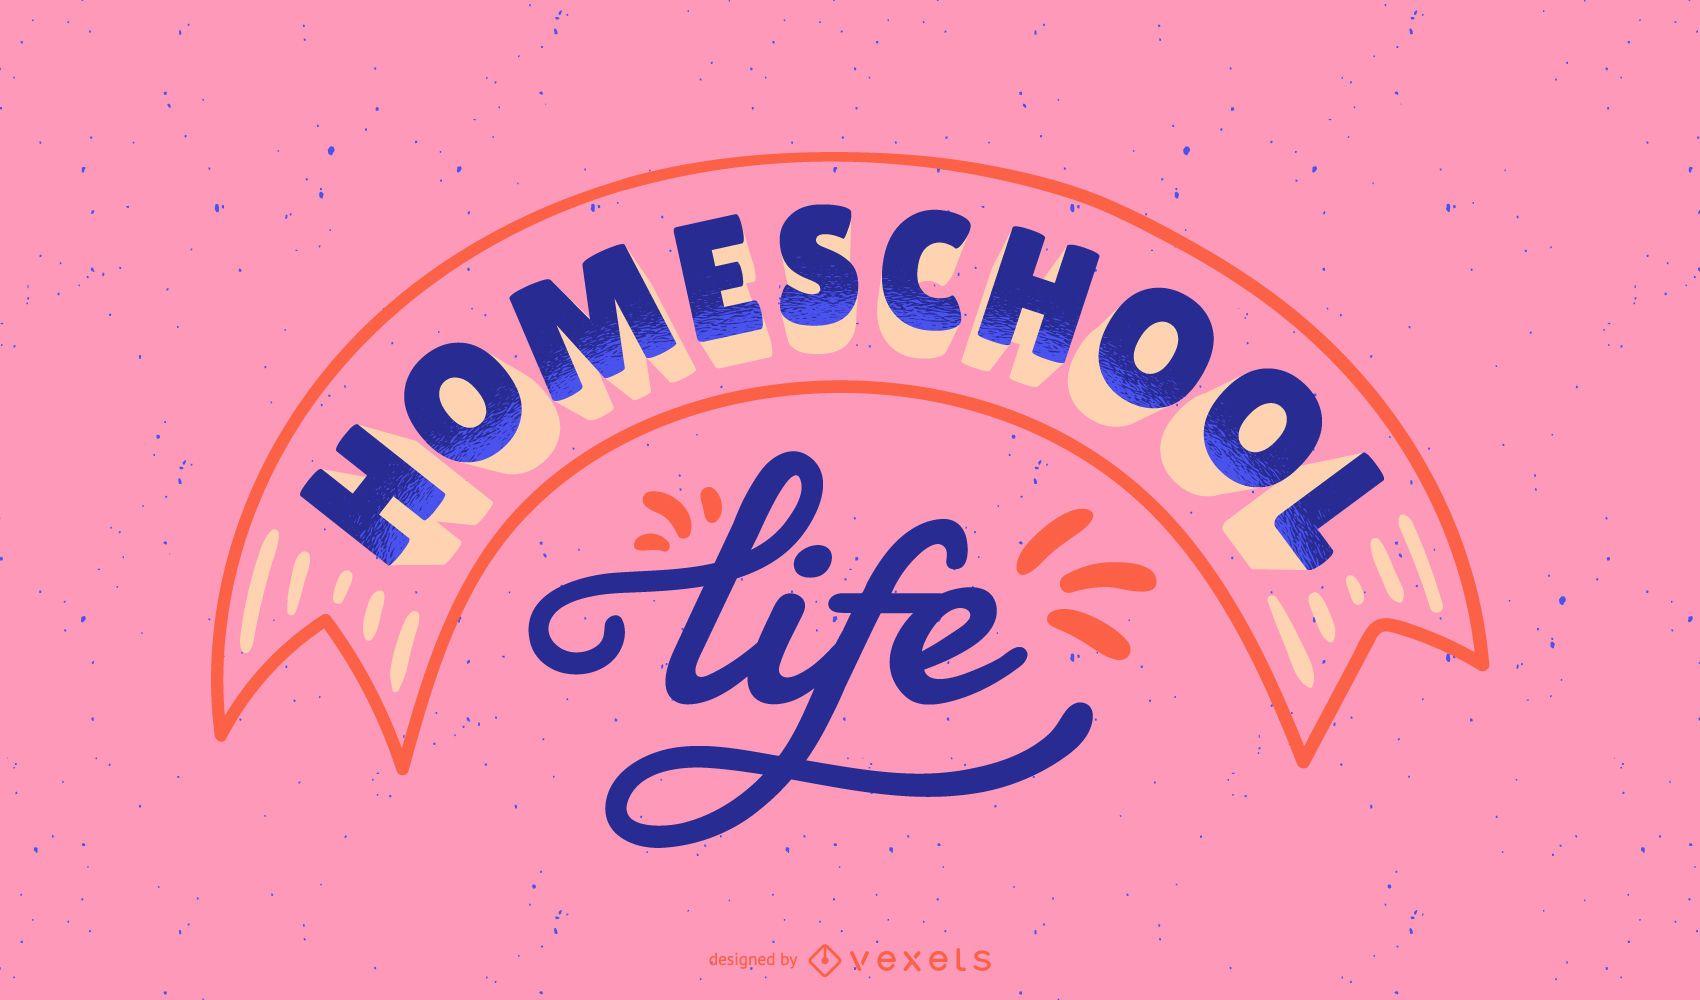 Homeschool life lettering design